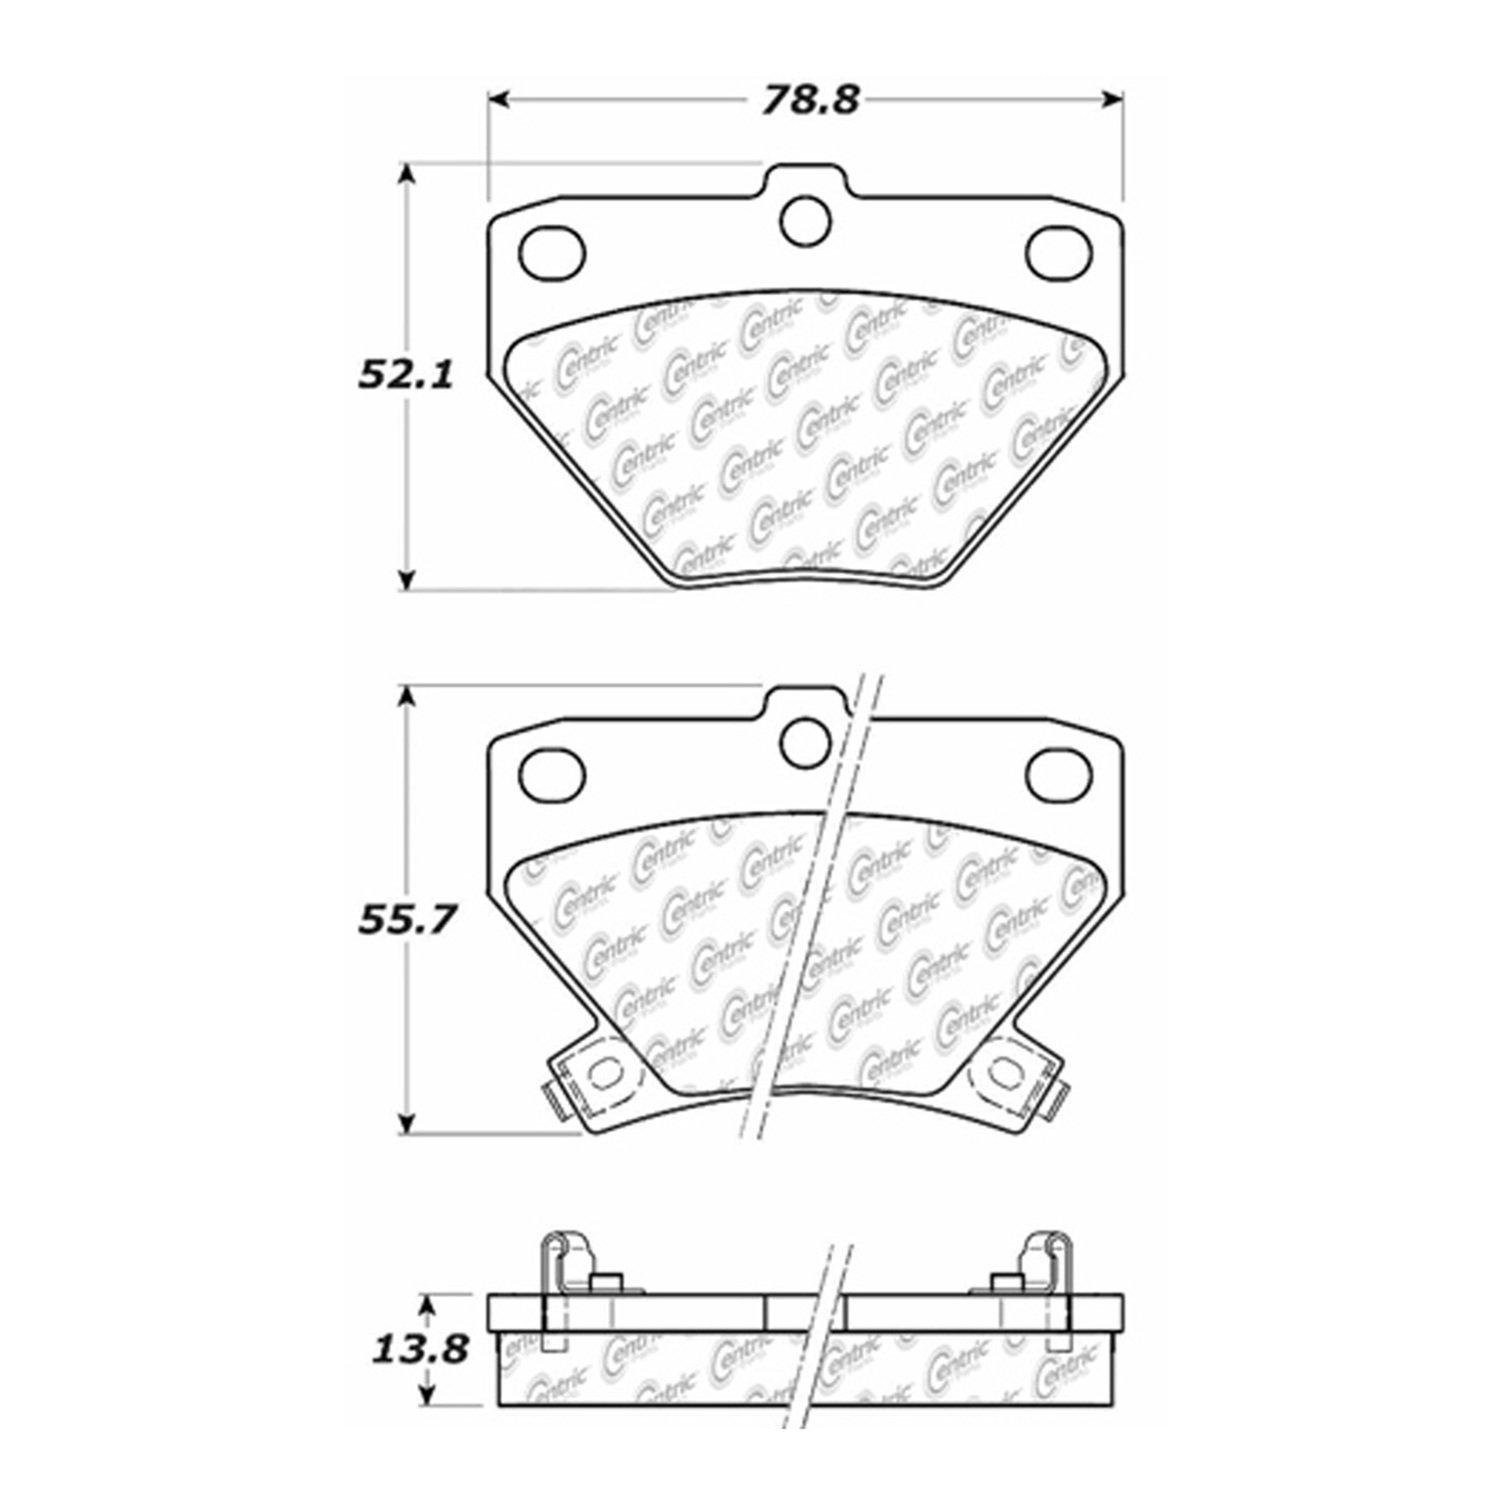 2004 Pontiac Vibe Disc Brake Pad Set Brakes Diagram Ce 10208230